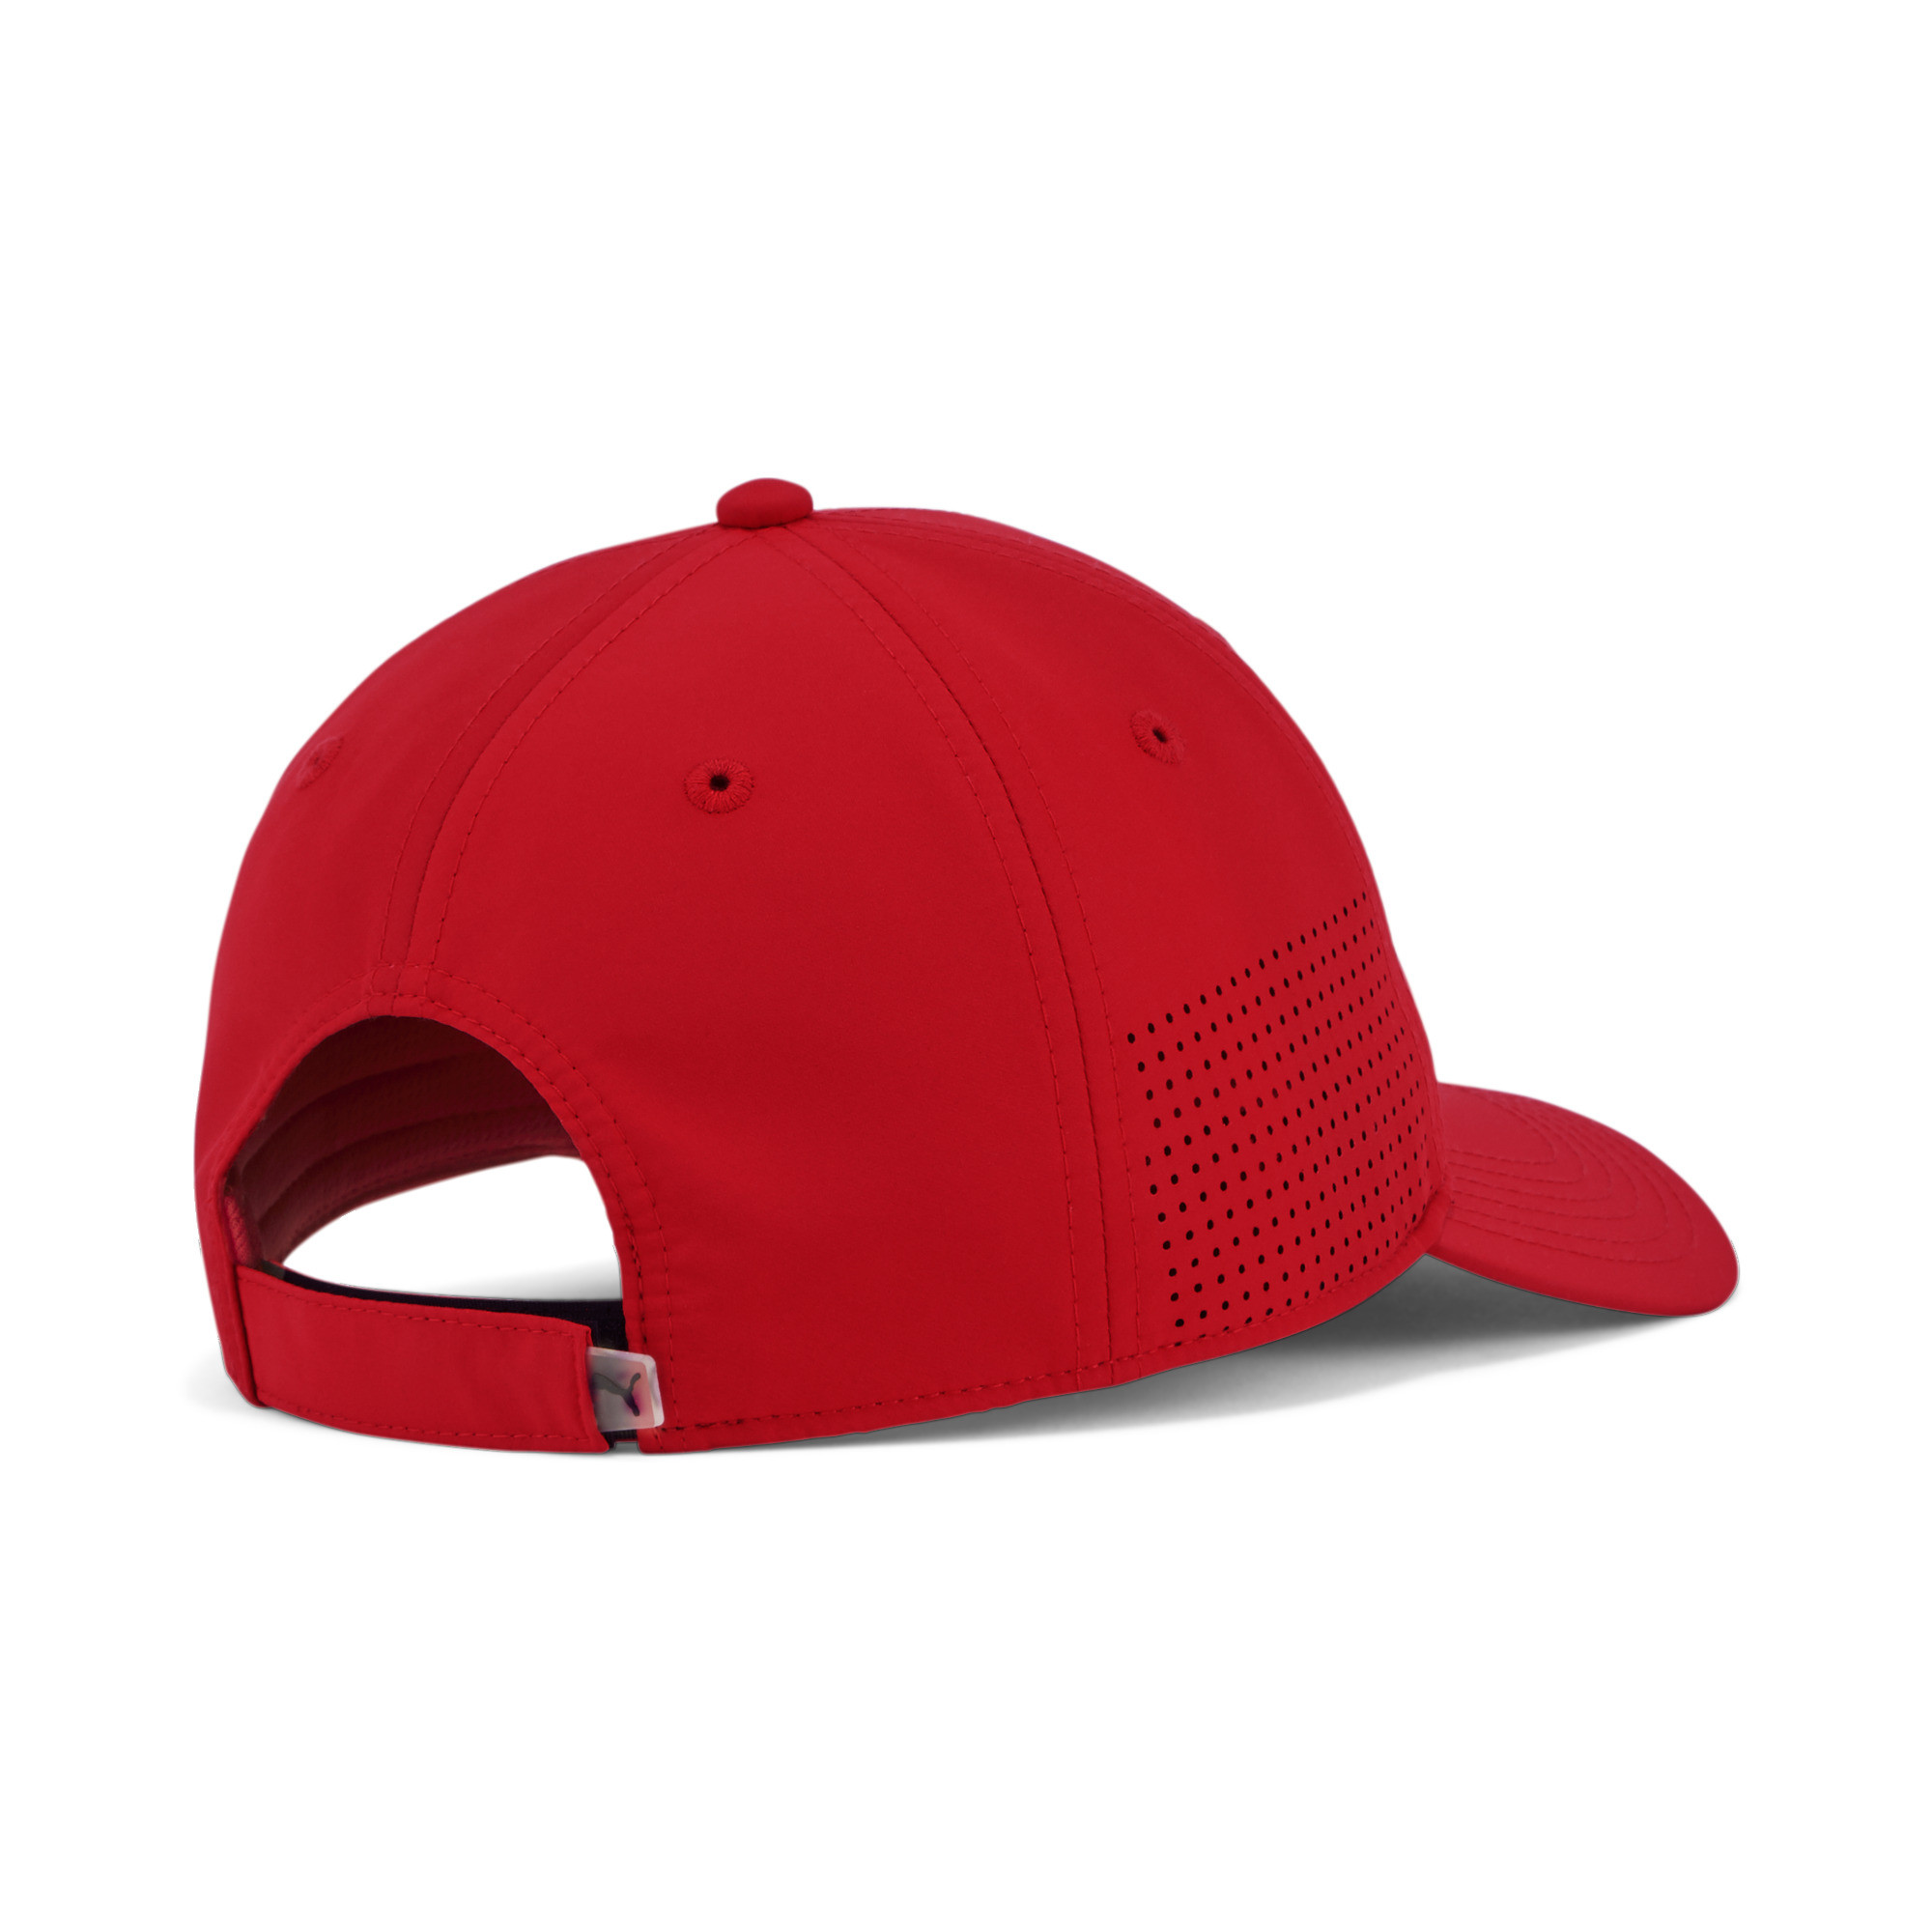 miniature 2 - Puma Men's Stream Perforated Adjustable Baseball Cap